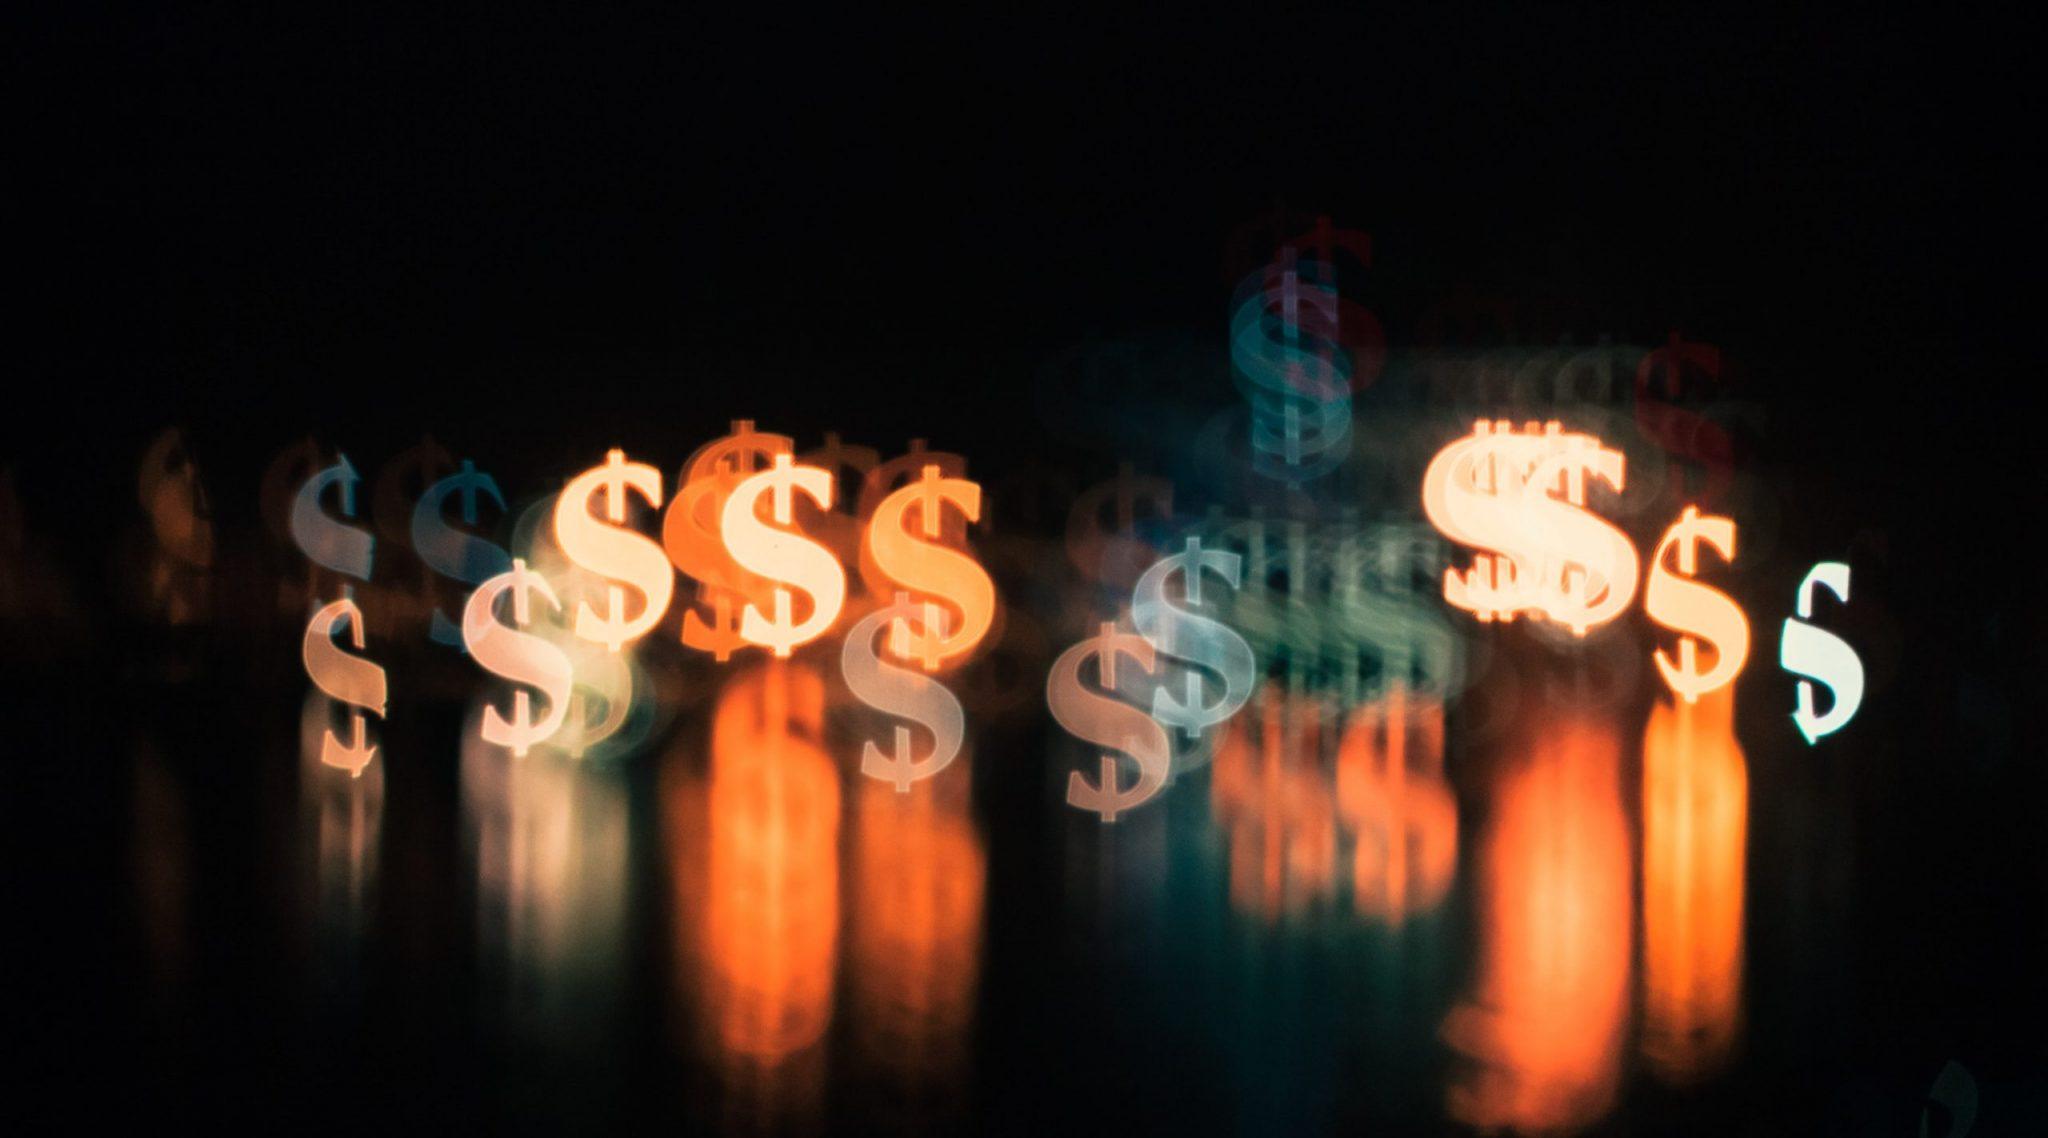 how to monetize digital art